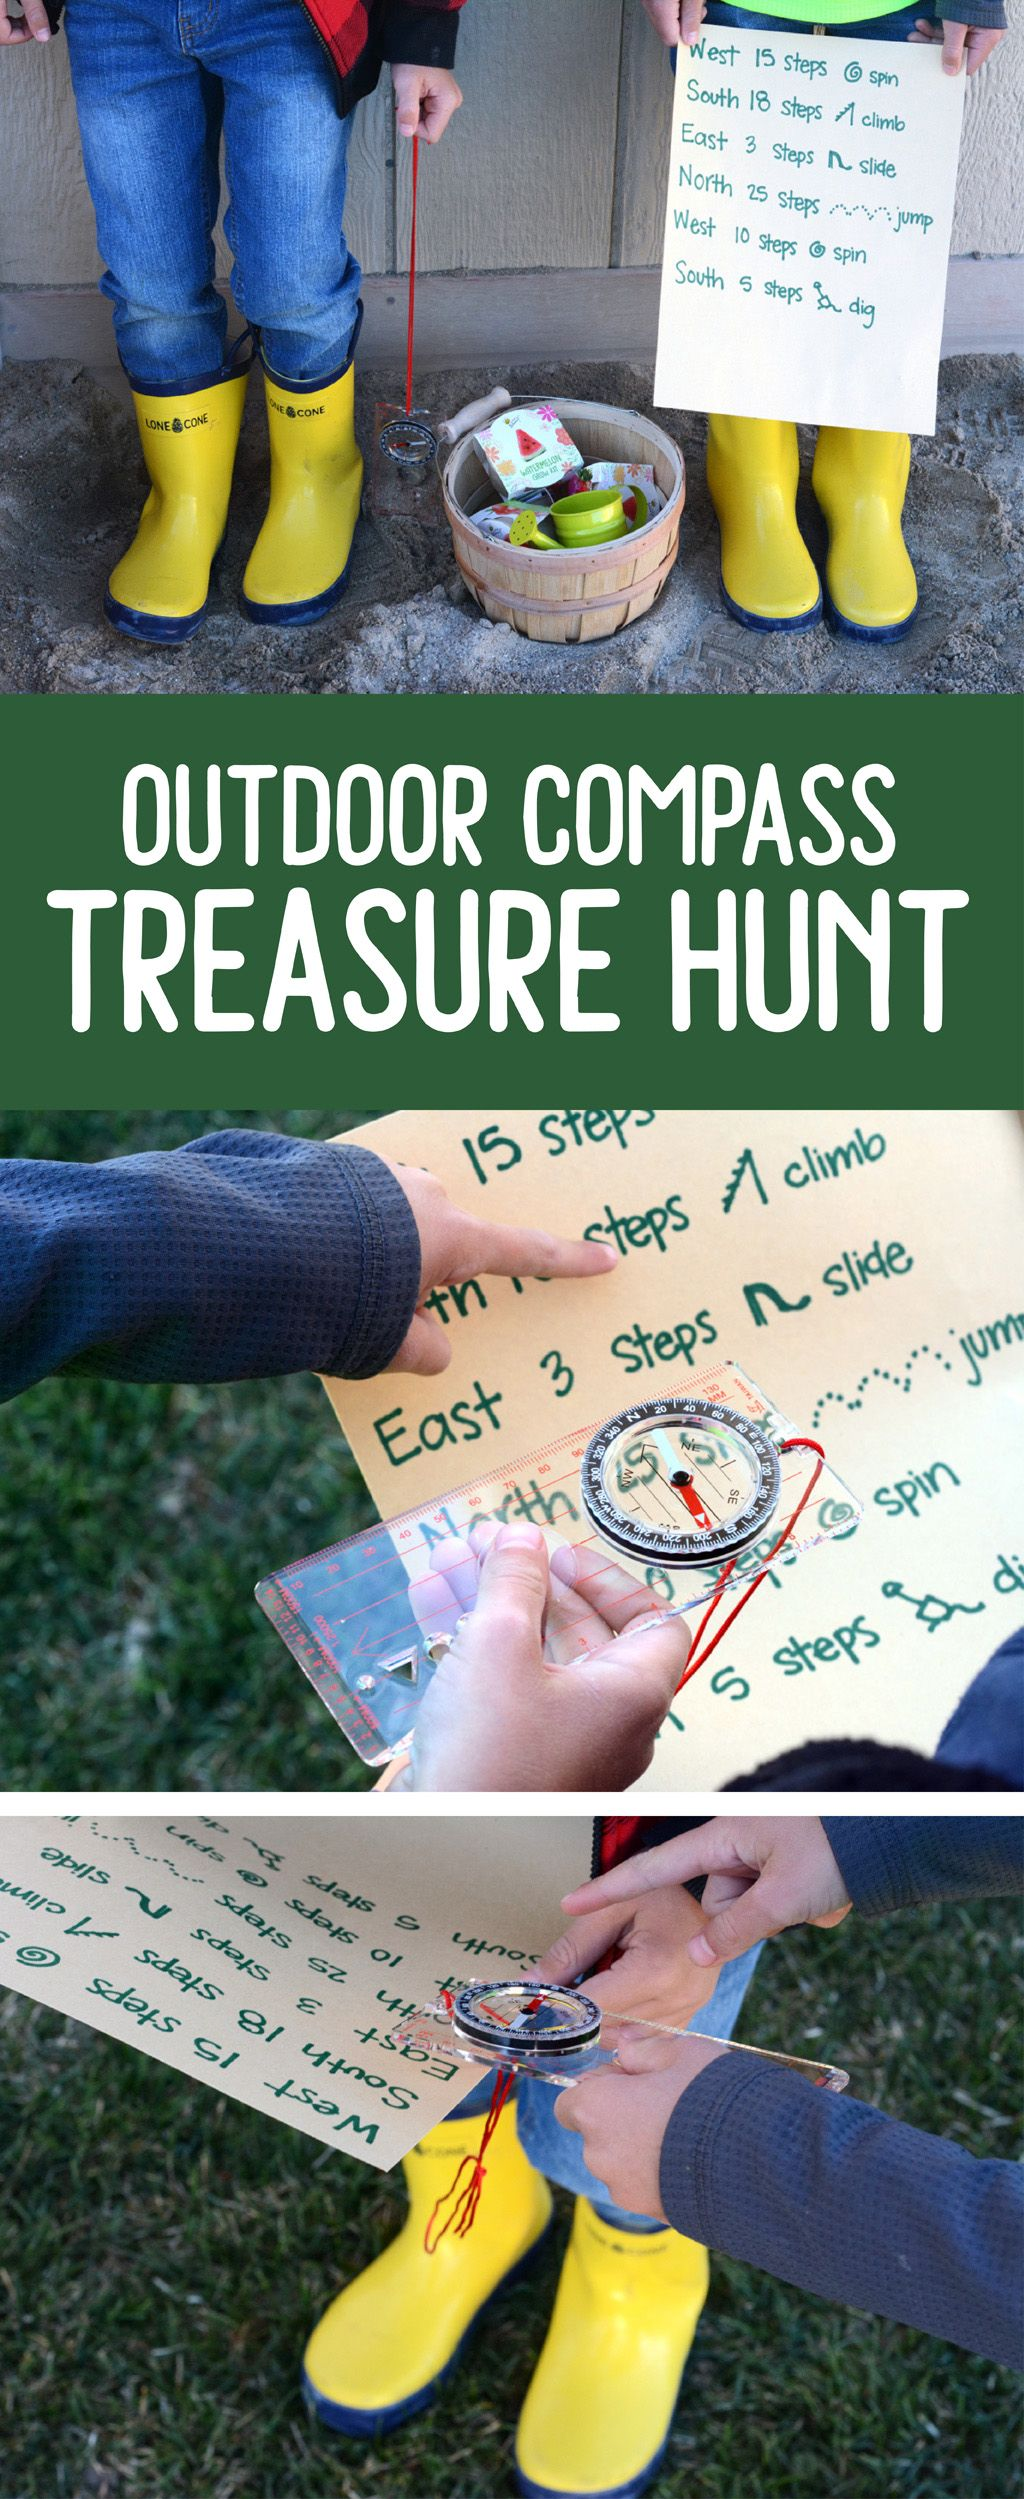 Chicks Treasure Location : chicks, treasure, location, Outdoor, Compass, Treasure, Crafting, Chicks), Kids,, Scavenger, Activities